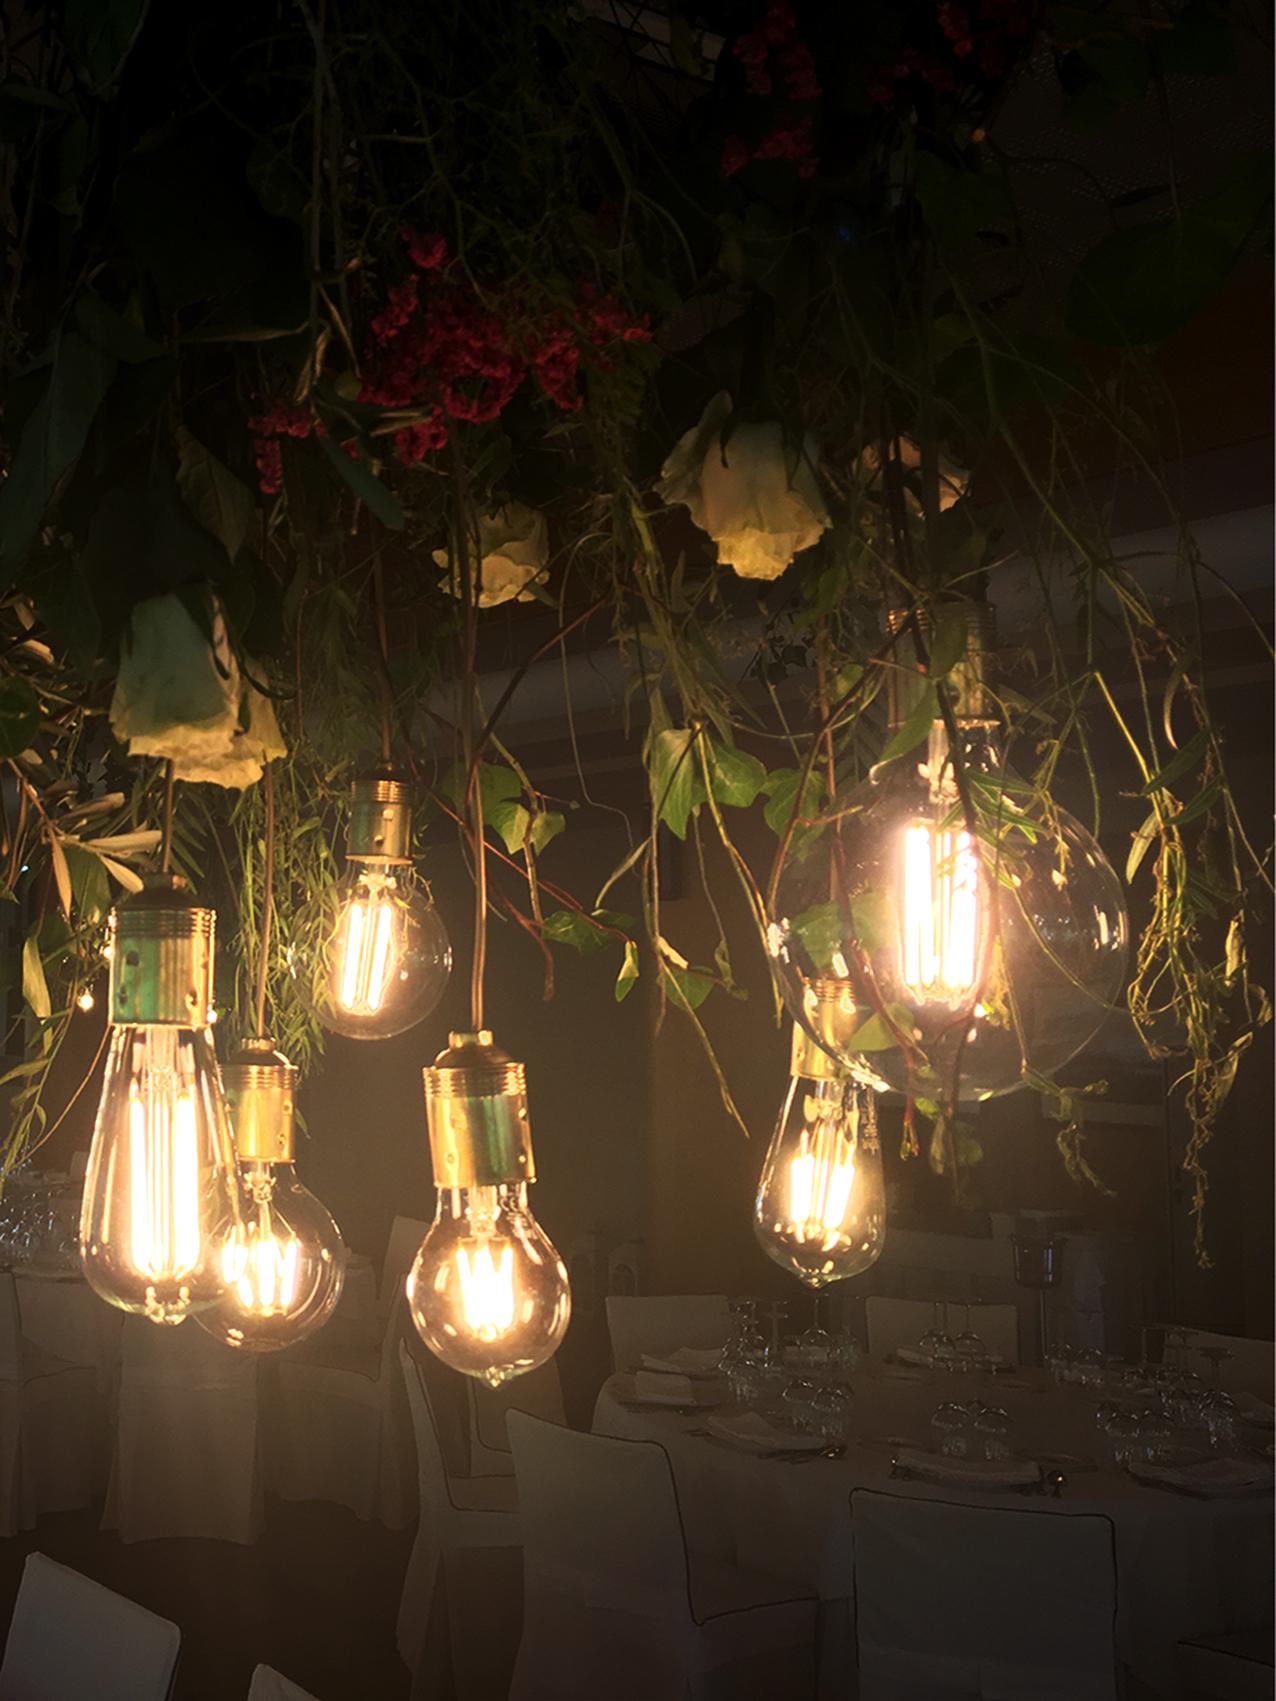 gv 2016 decoracion iluminacion ambientacion luminica evento ceremonia boda gijon asturias españa 2016 001